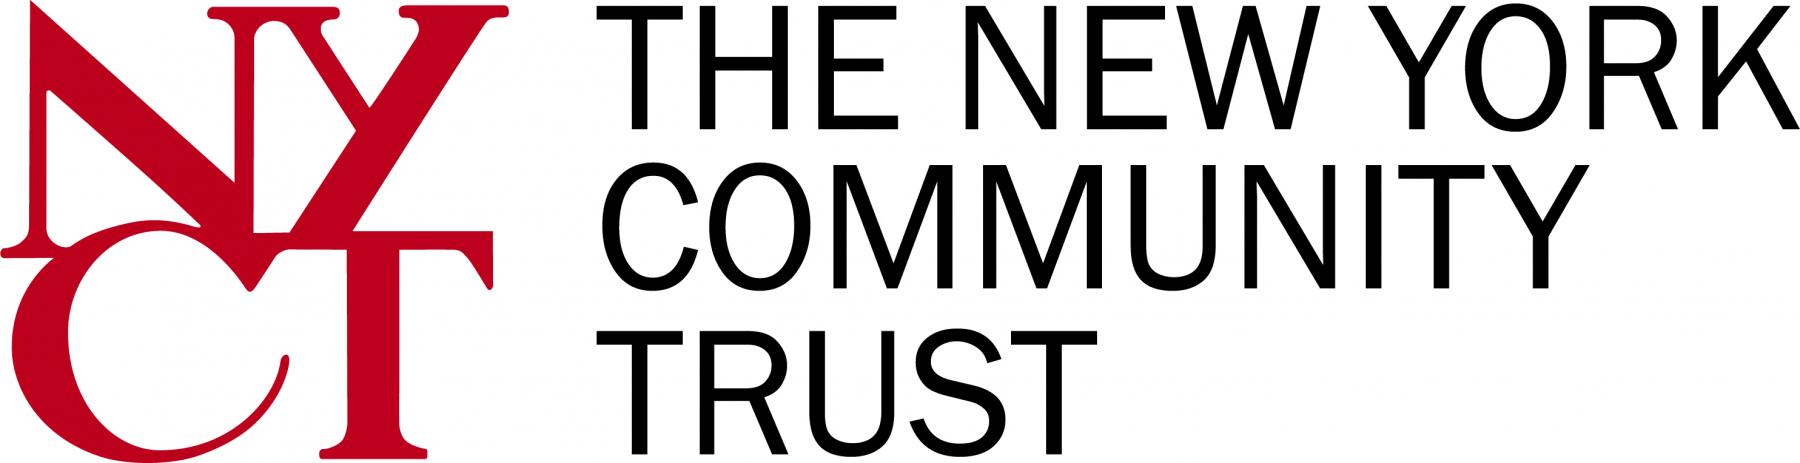 NYCT-New_StyleGuide_Logo